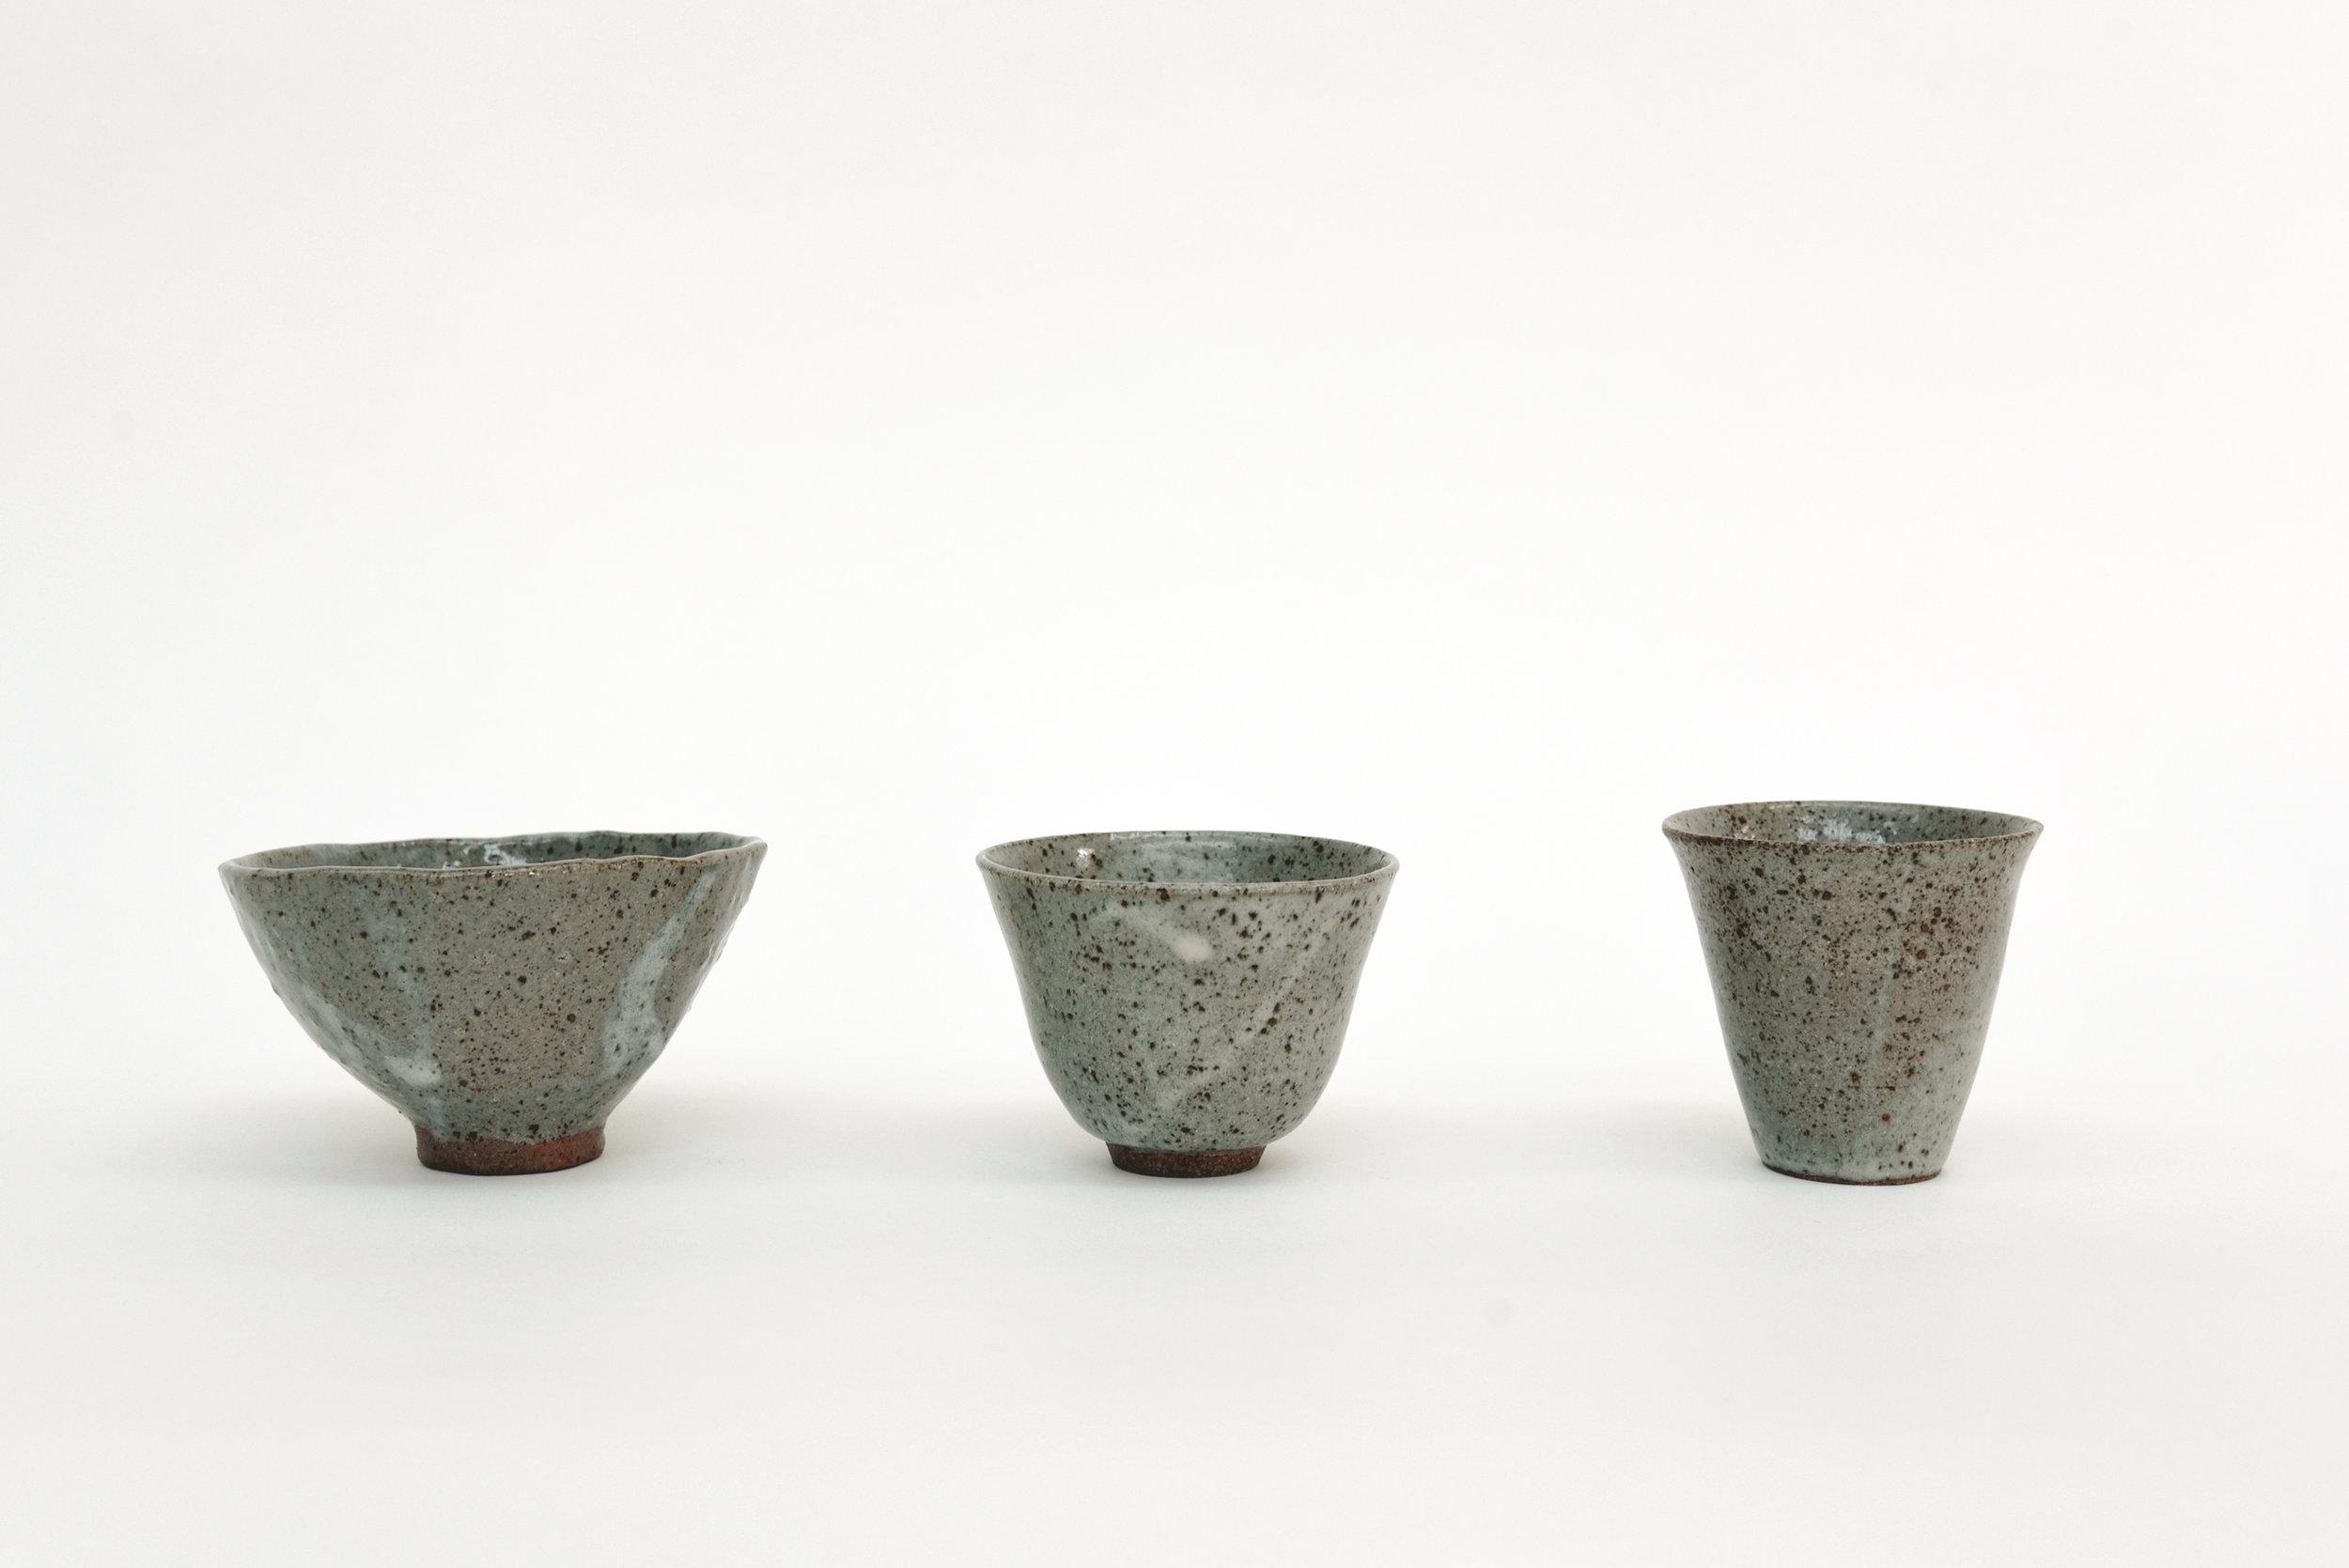 柴灰釉及還原燒製 ash glaze and reduction firing 2018